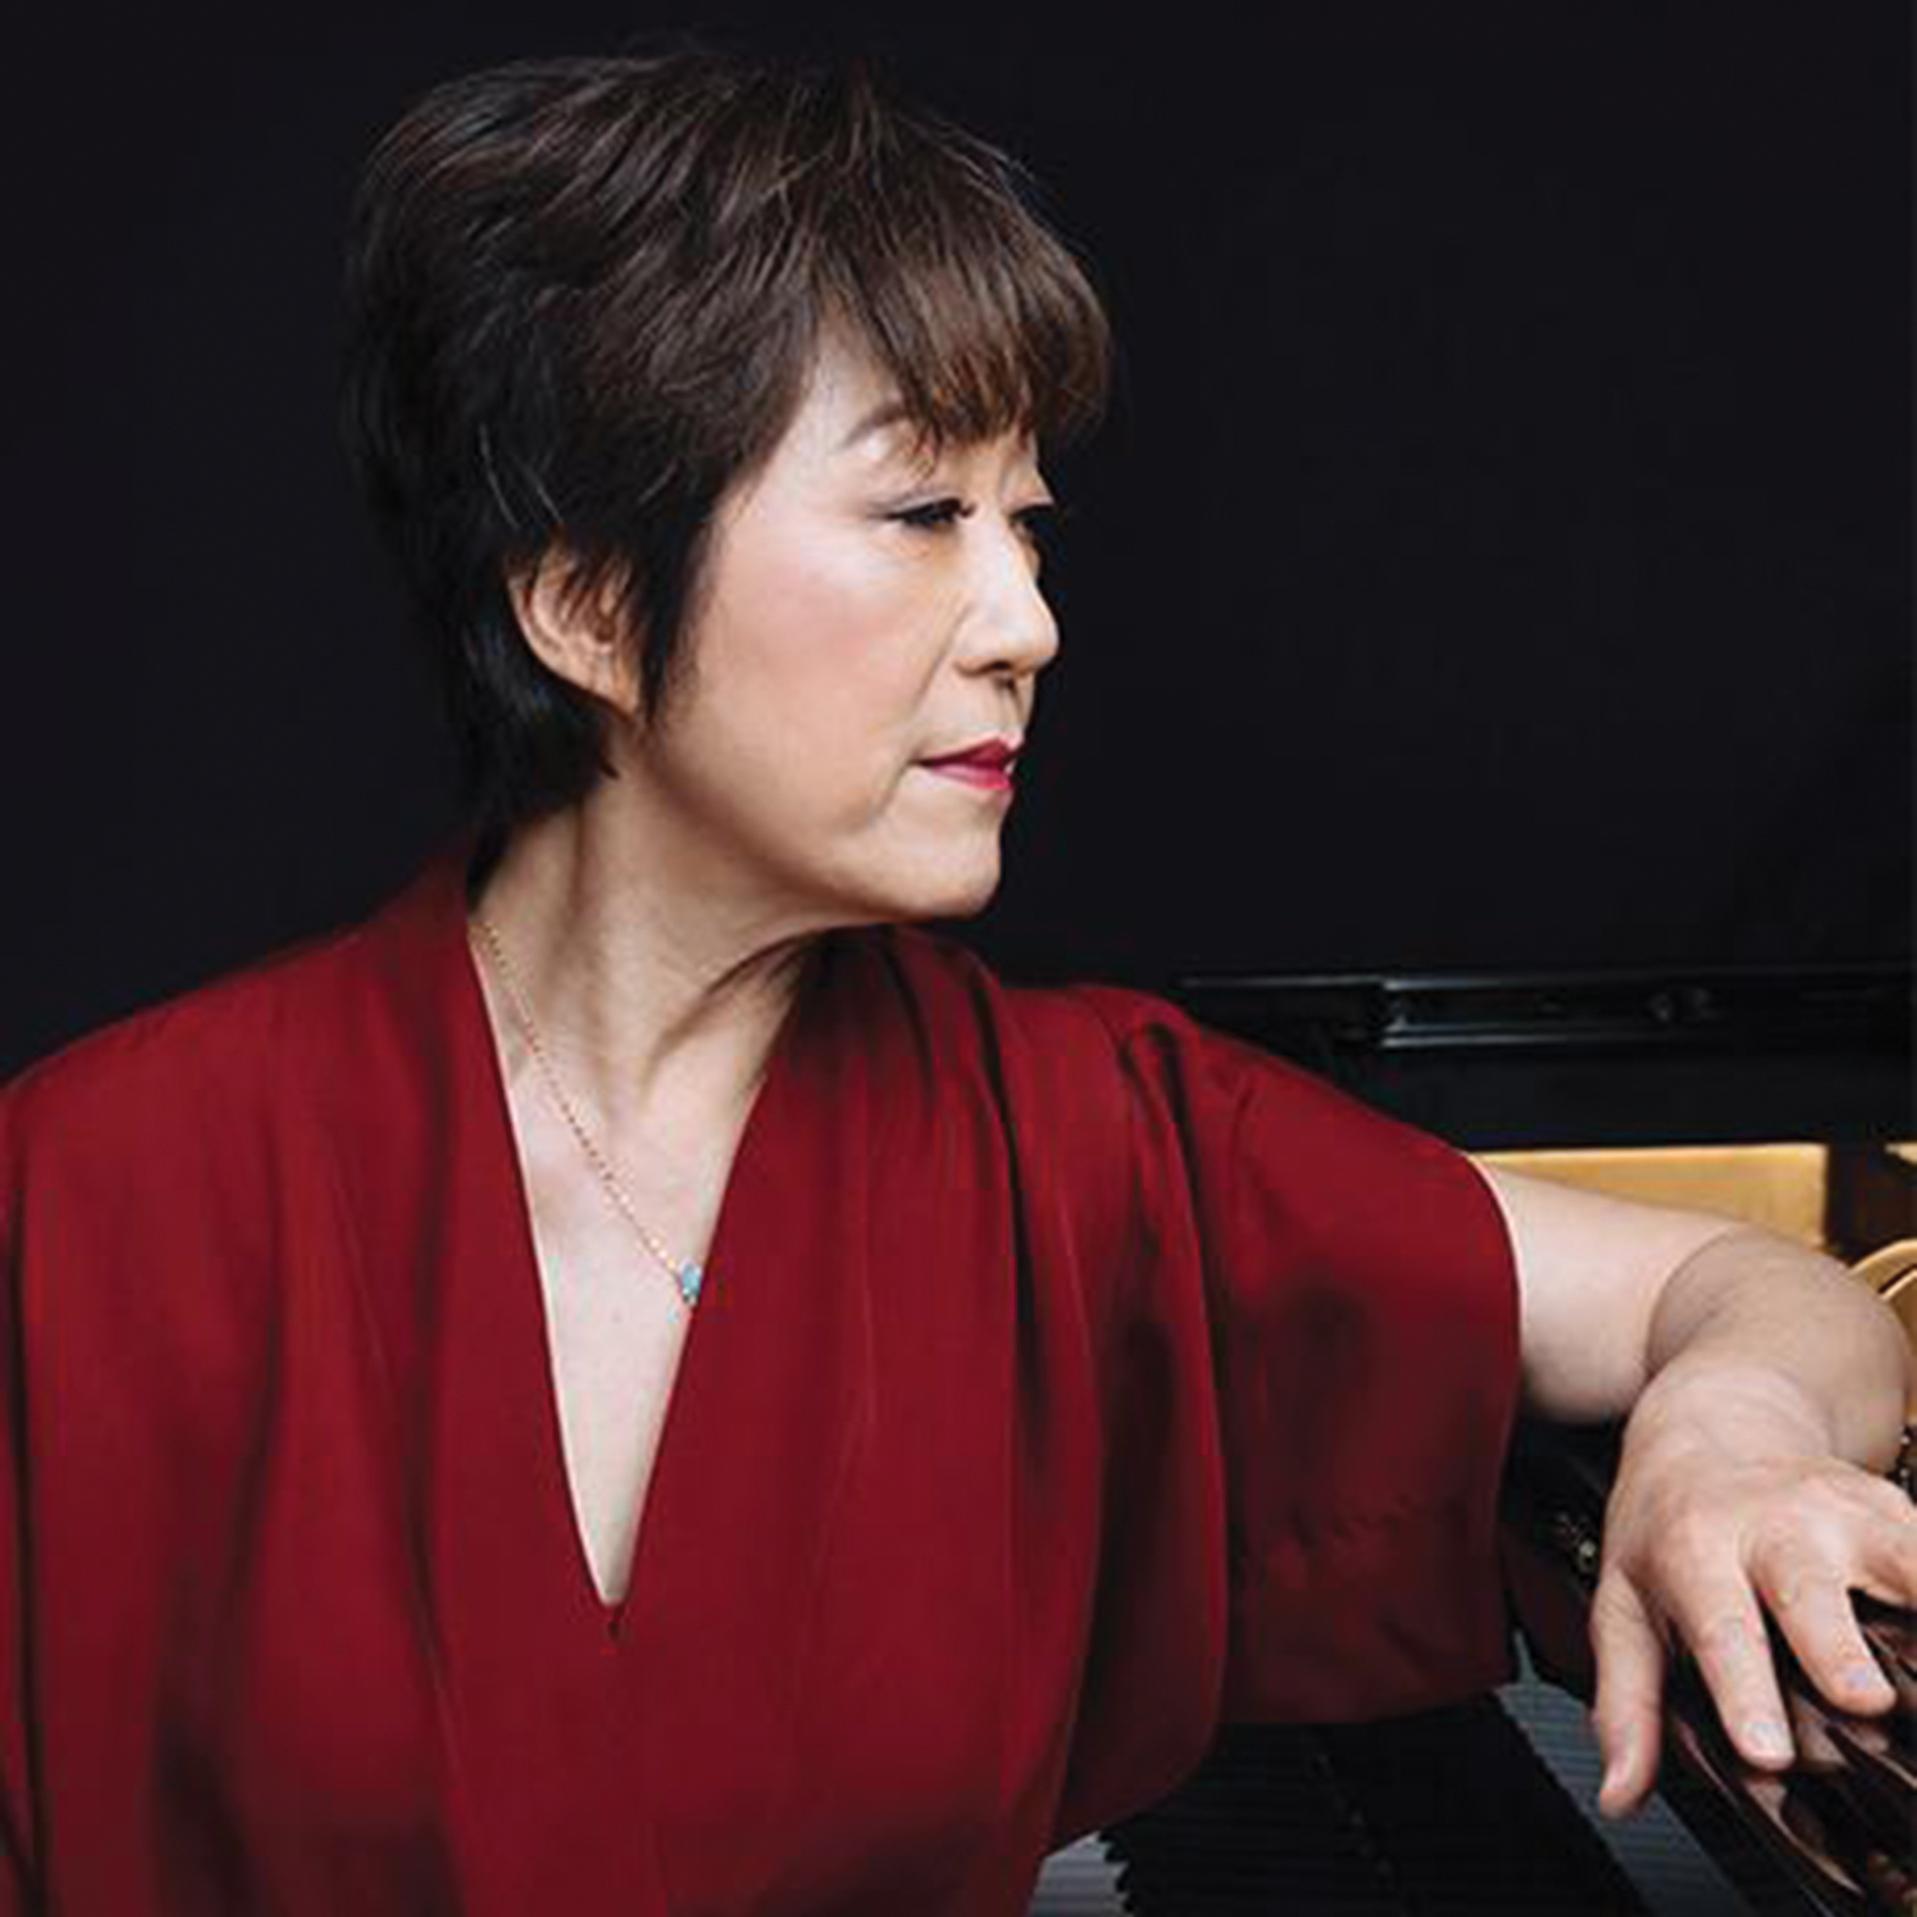 Yong Hi Moon